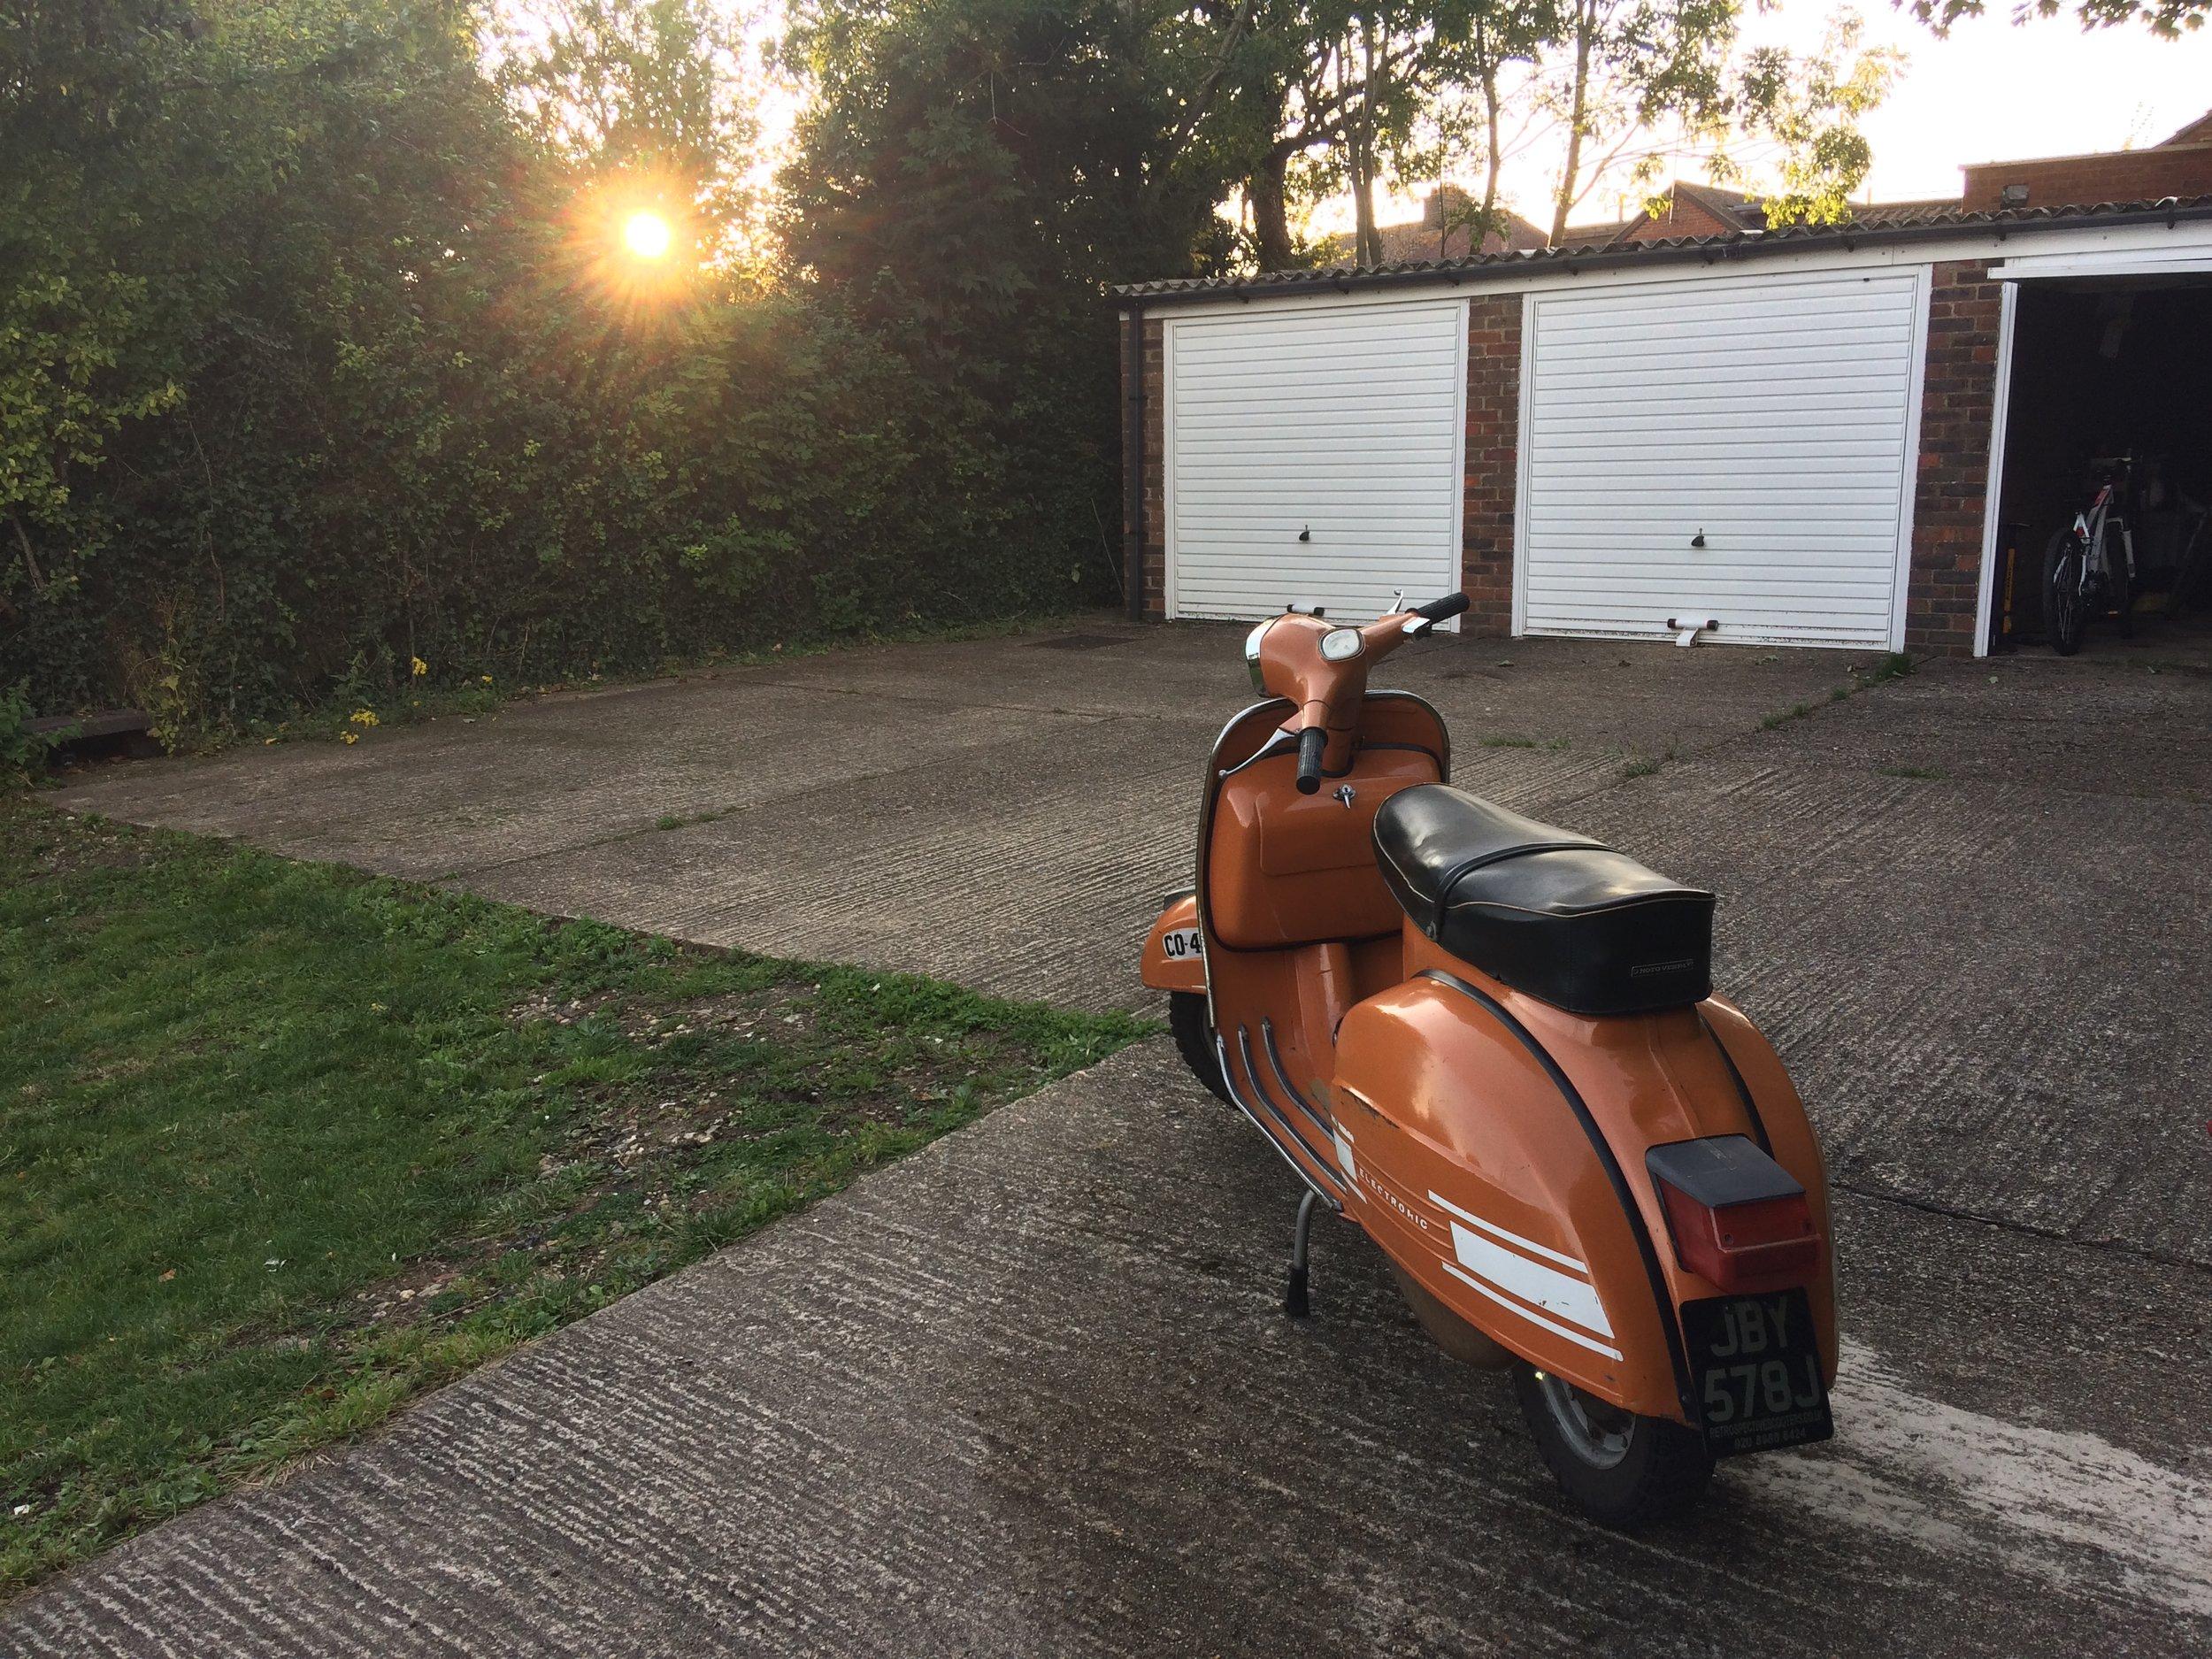 Summer evening scooter wash & wax